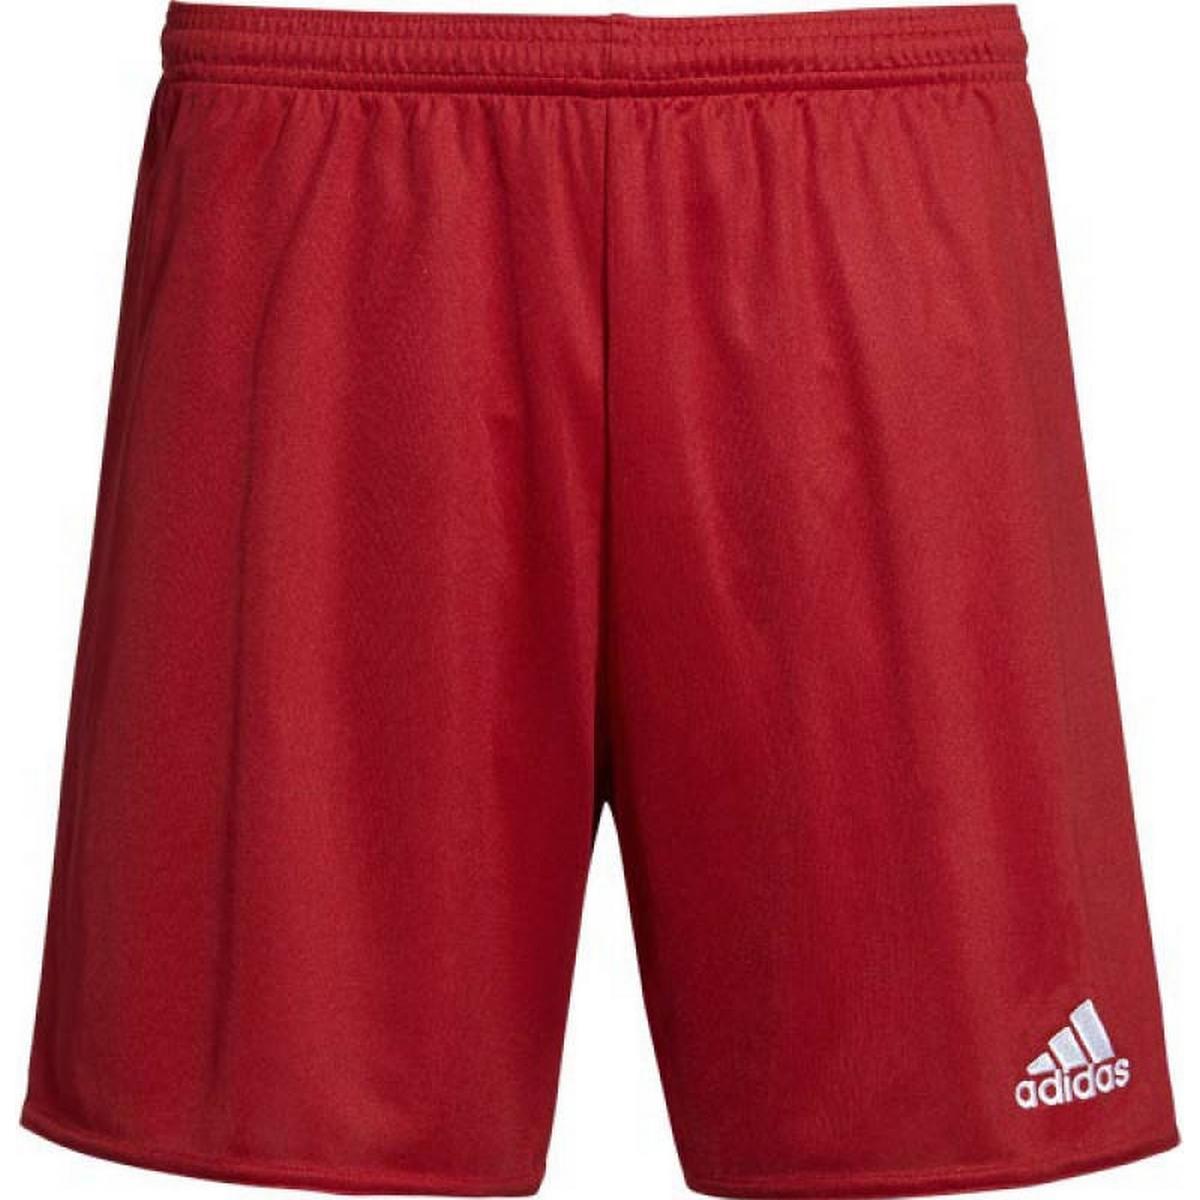 30d7e94df83 Adidas Håndbold Sportstøj - Sammenlign priser hos PriceRunner